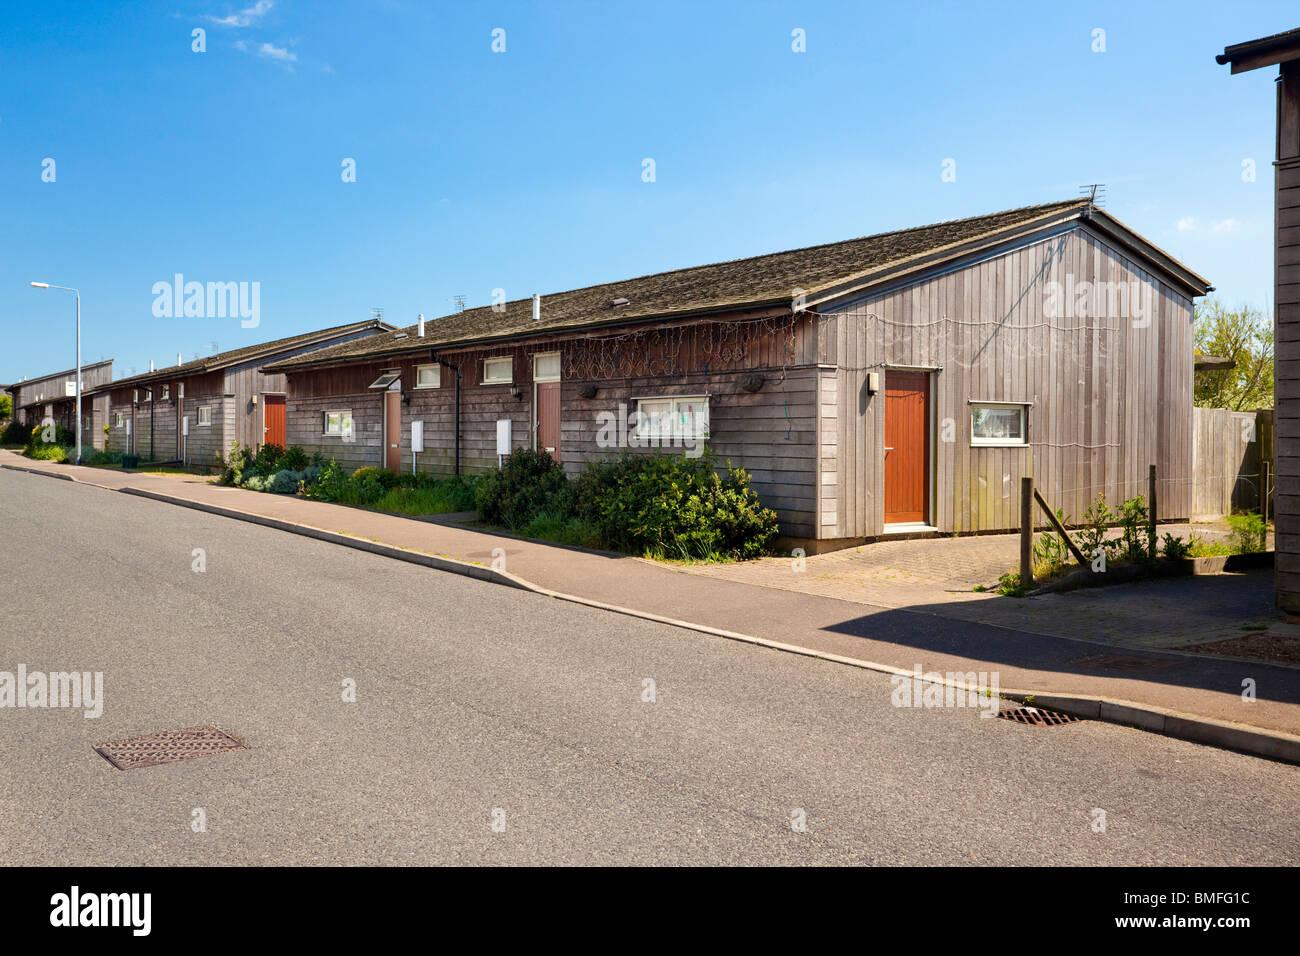 low cost housing in Jaywick Sands Essex UK Stock Photo